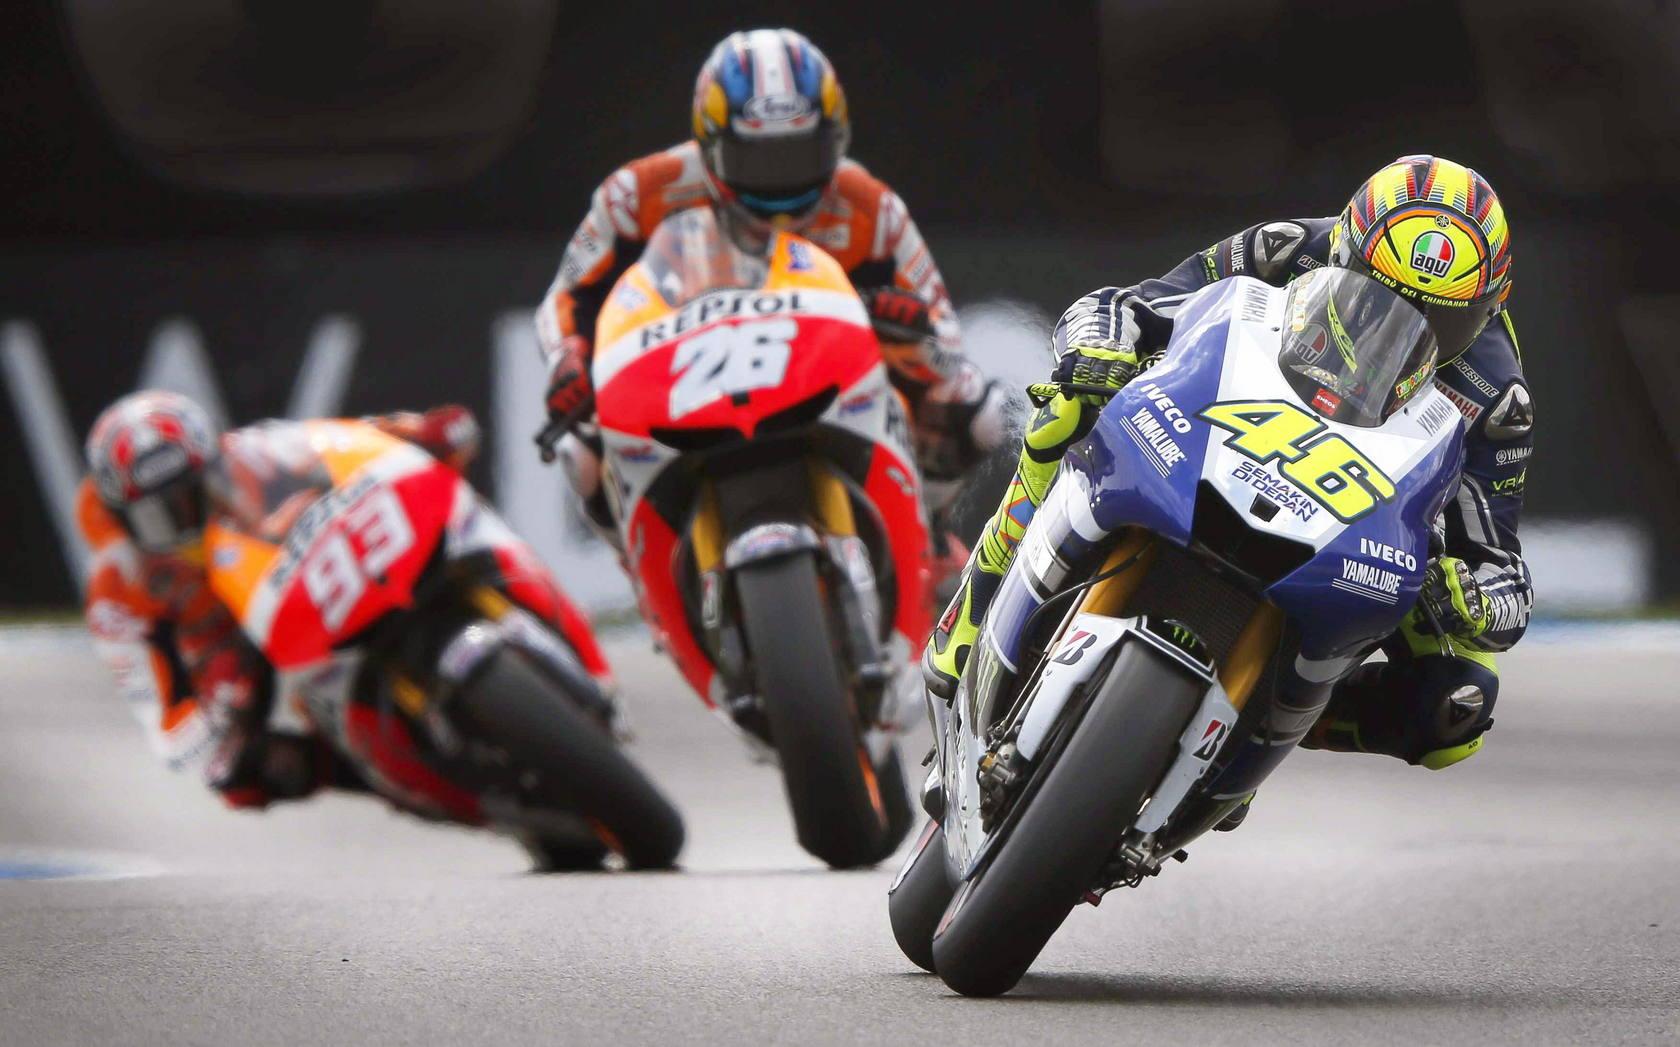 Valentino Rossi ganó el GP de Holanda; Lorenzo heroico